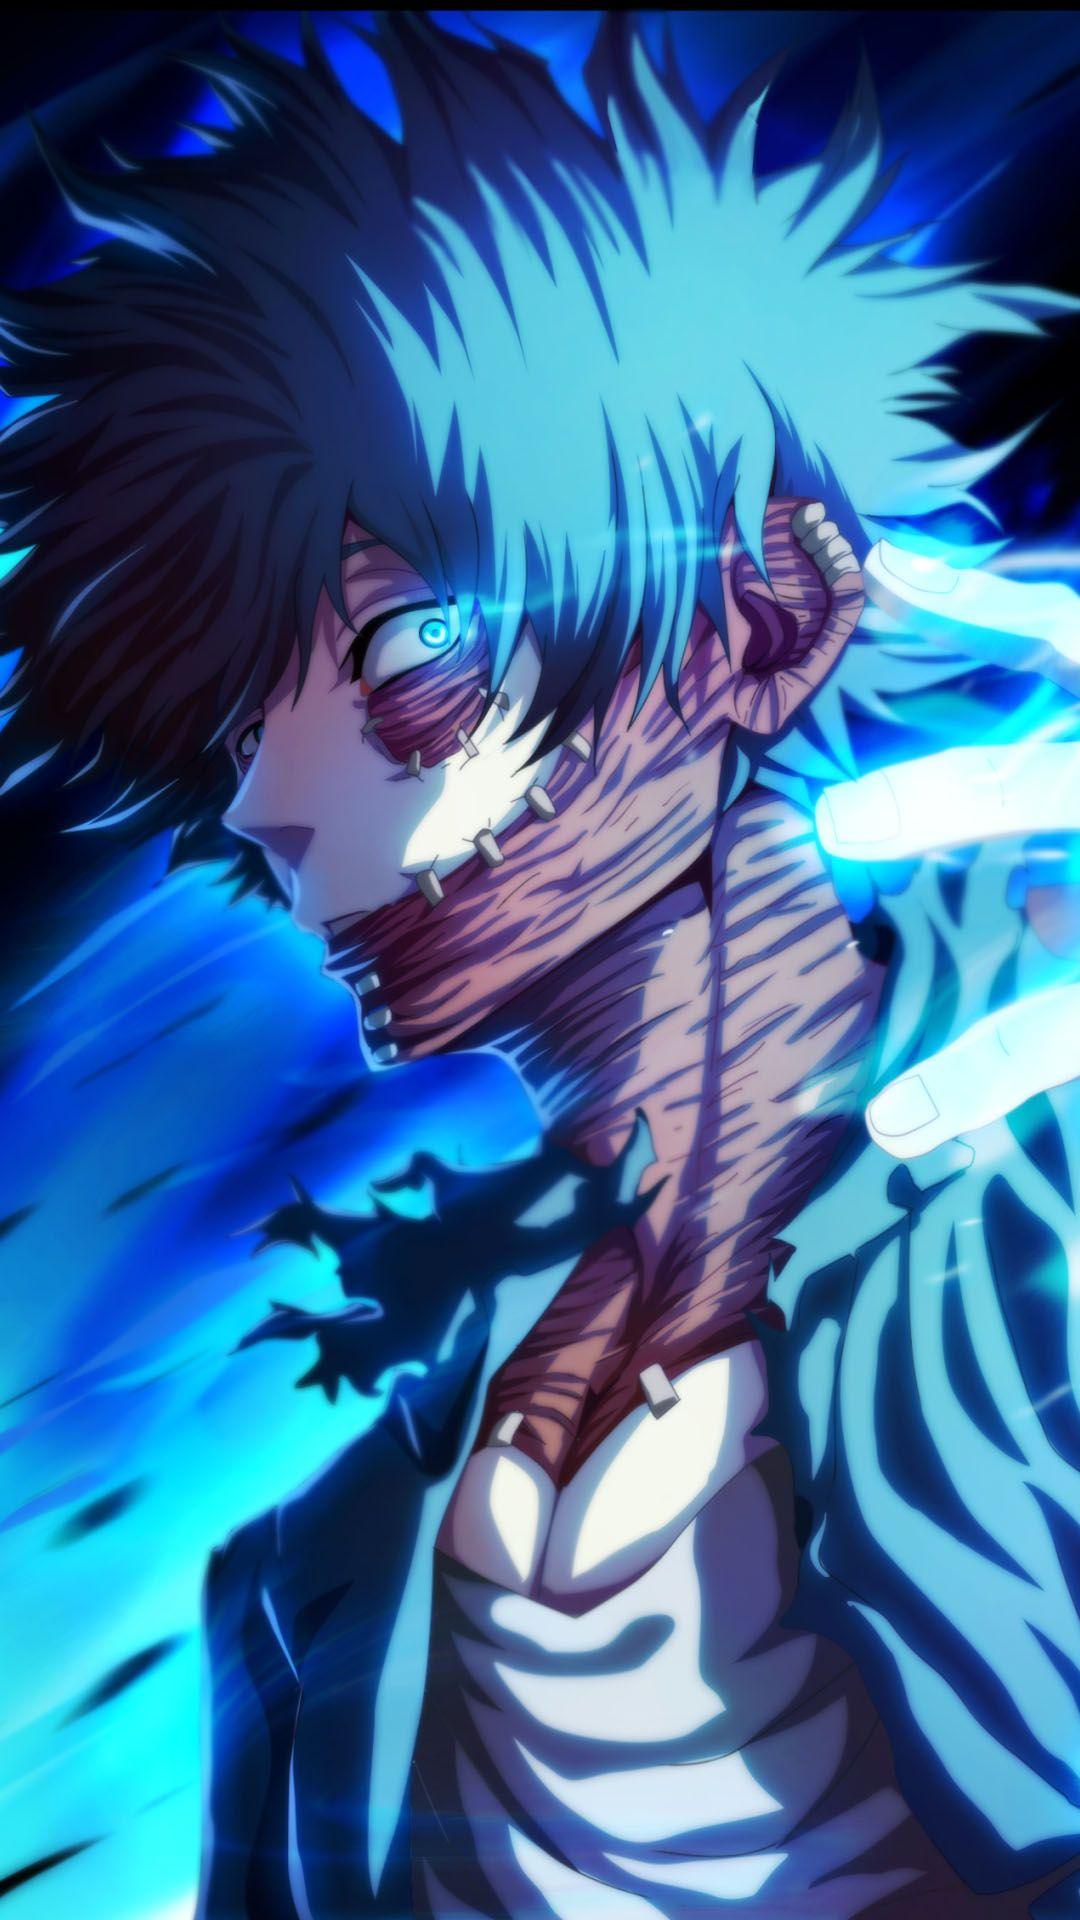 Dabi My Hero Academia 1080x1920 Mobile Wallpaper Anime Guys Cool Anime Pictures Hero Wallpaper